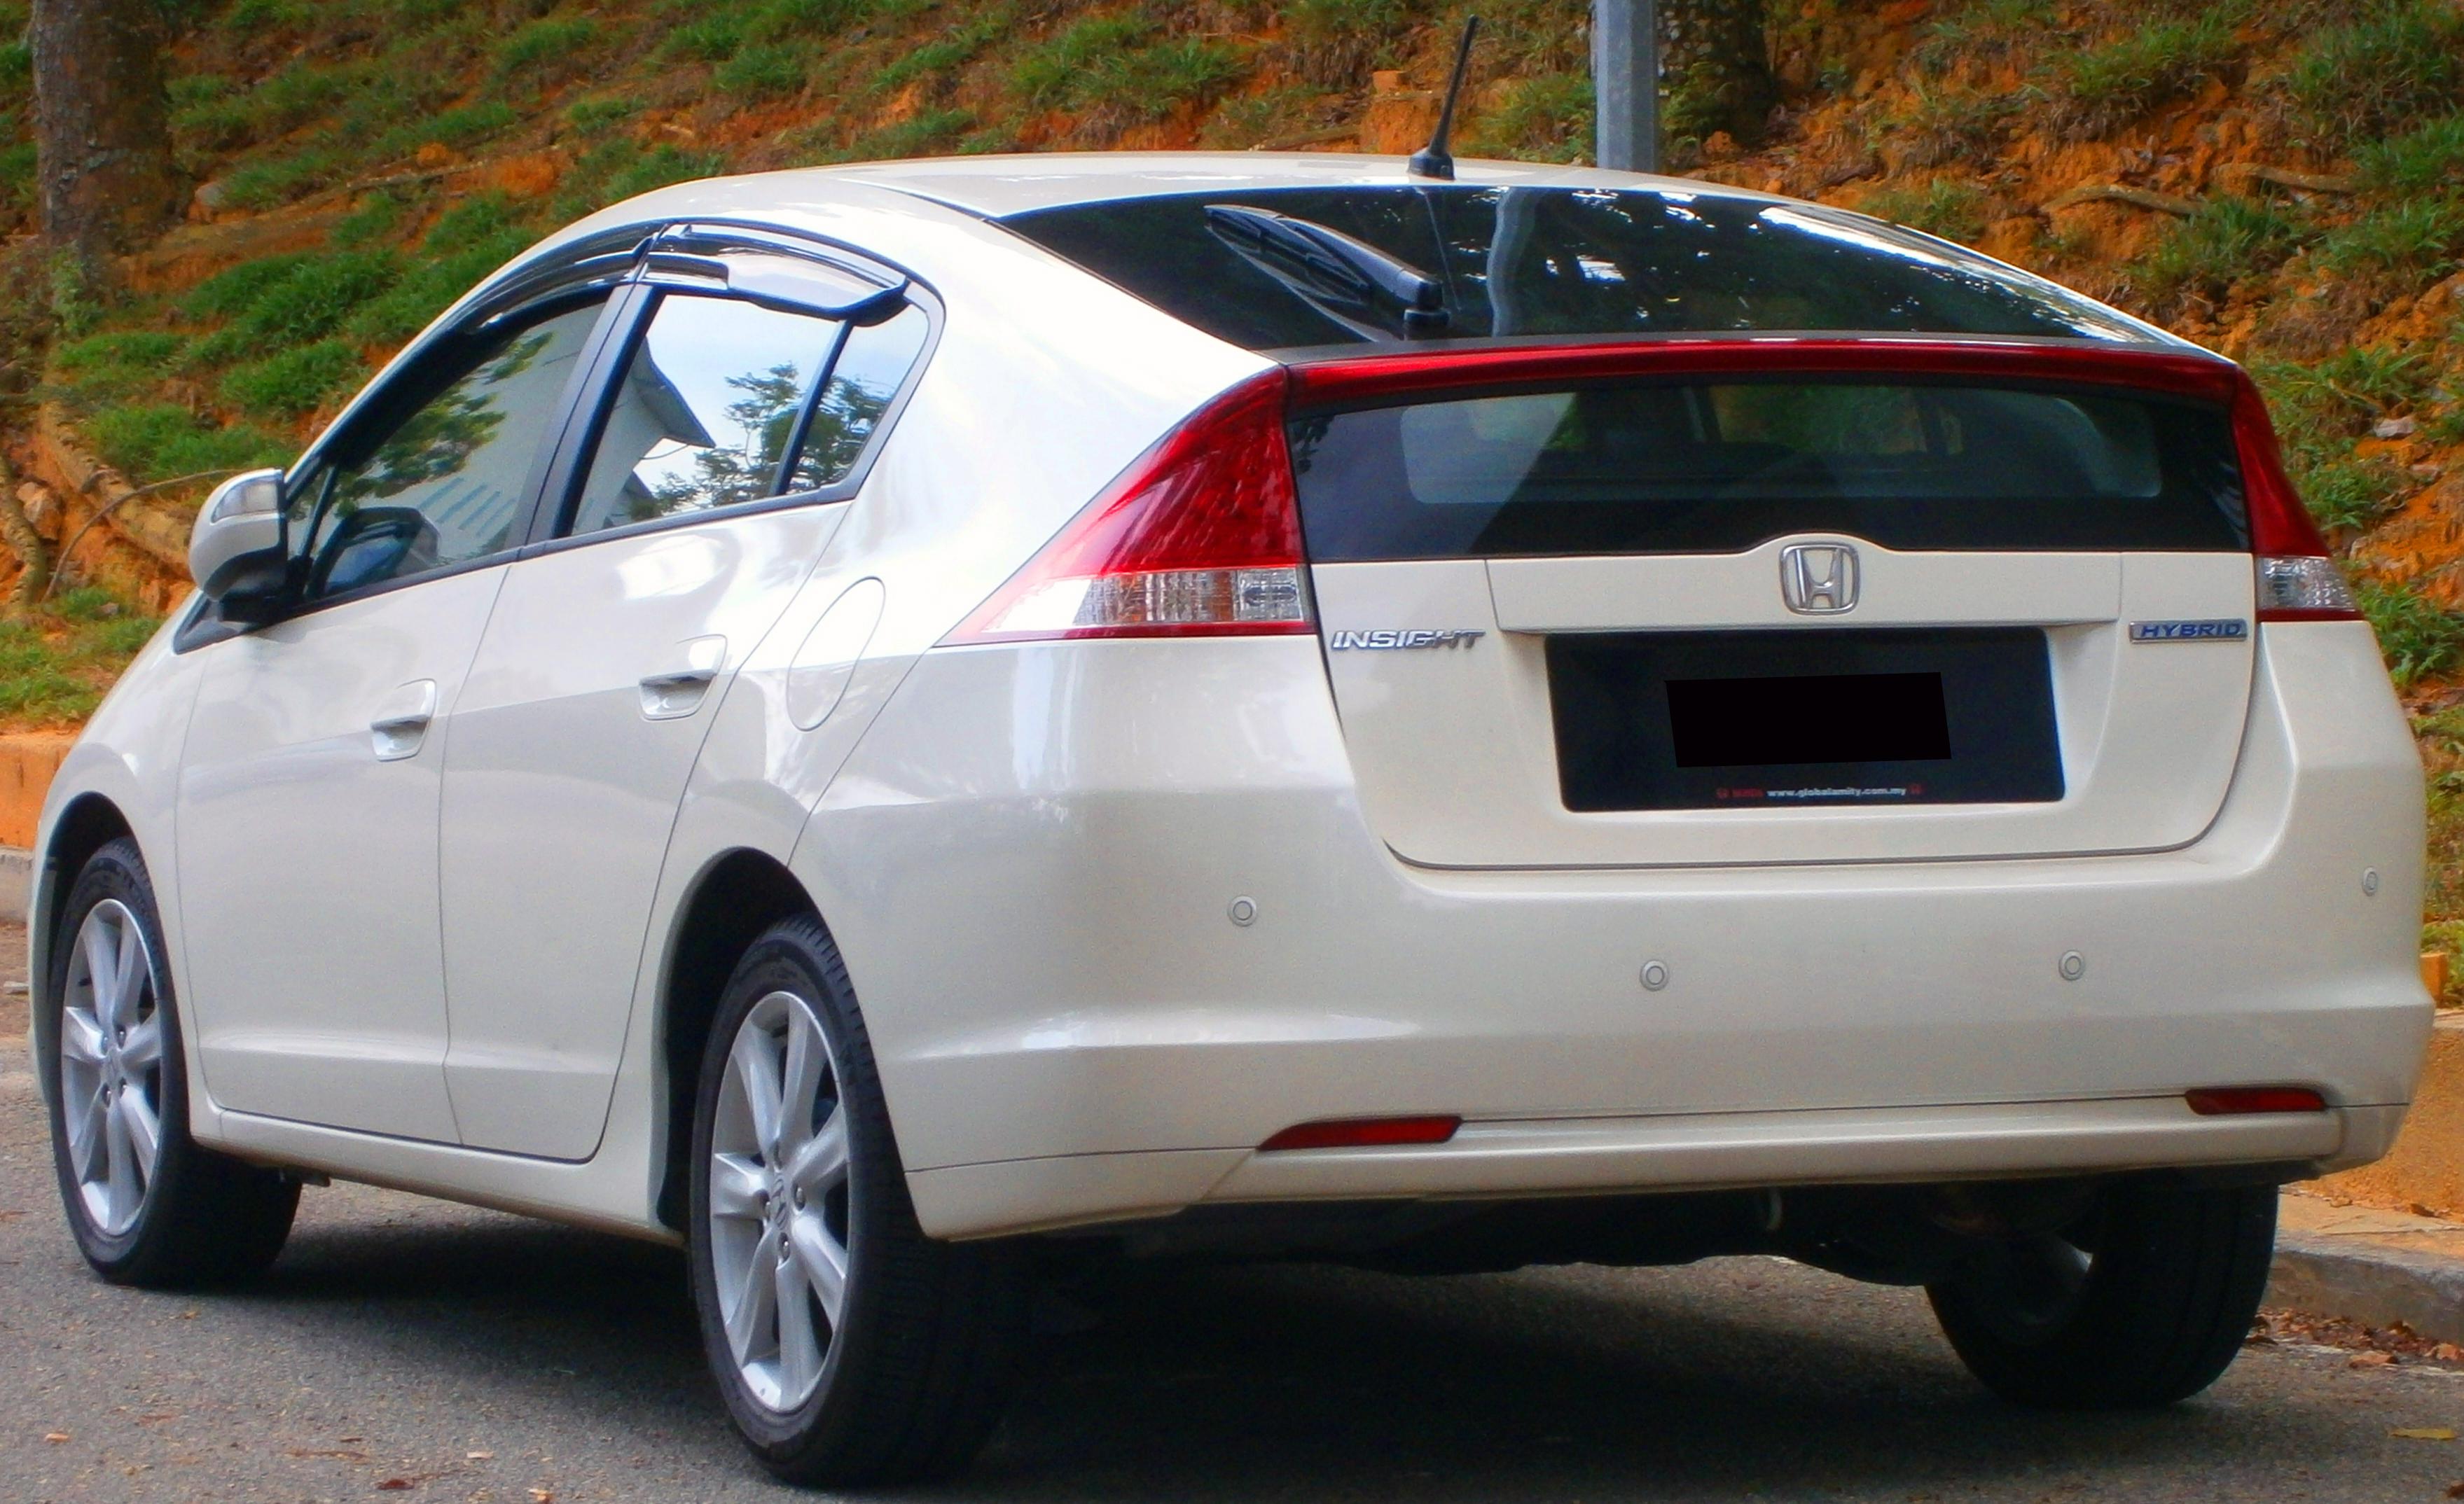 Description 2011 Honda Insight Hybrid in Cyberjaya, Malaysia (02).jpg